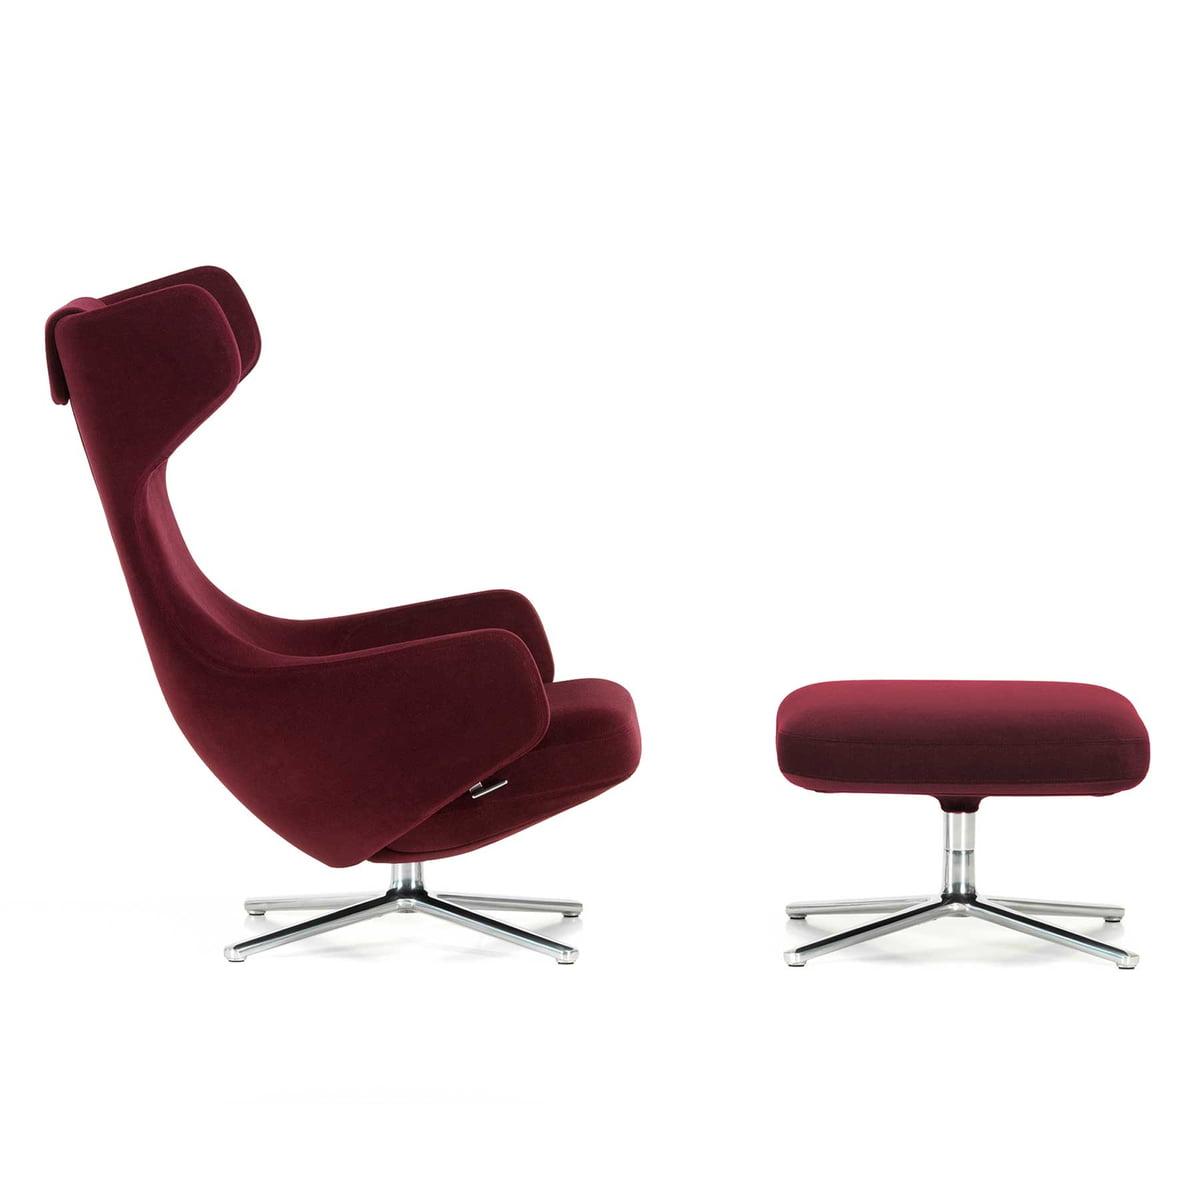 Ohrensessel design  Designer Sessel Ei: Fritz hansen egg chair von arne jacobsen 1958 ...